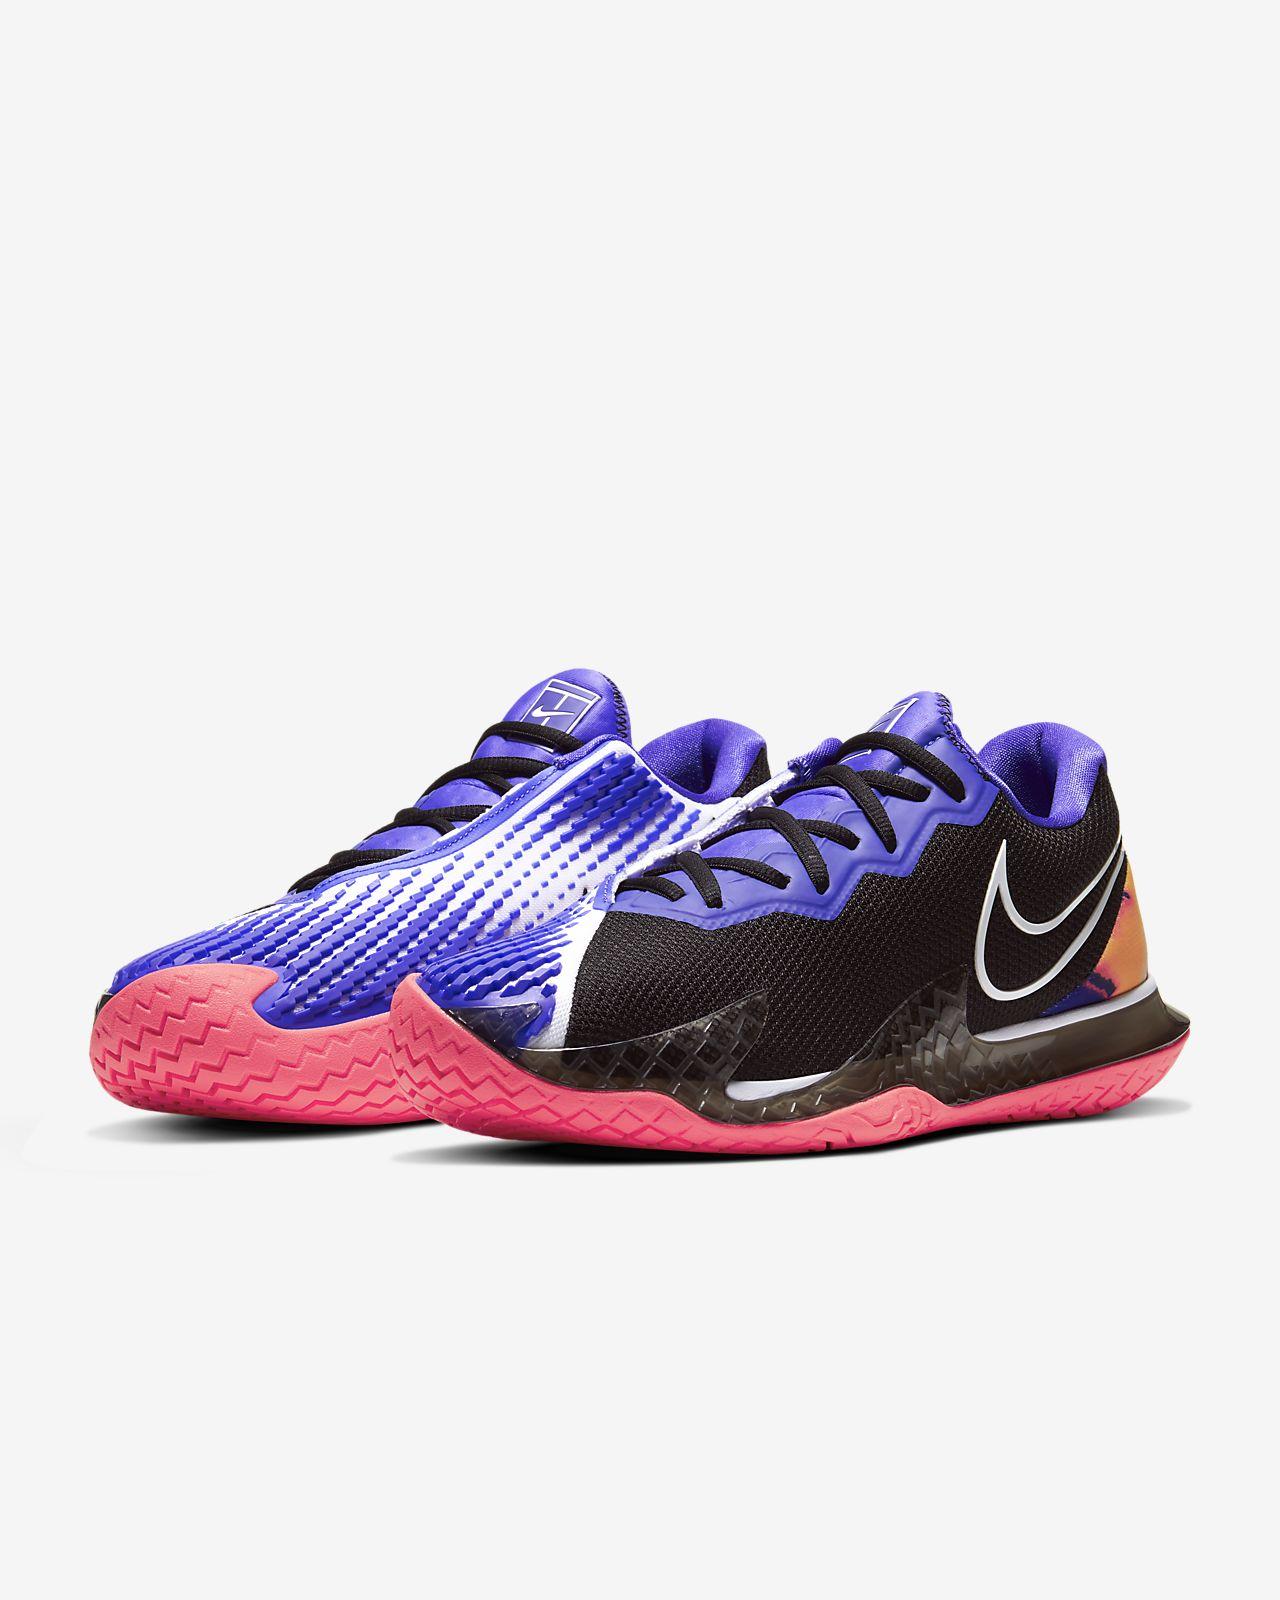 NikeCourt Air Zoom Vapor X hardcourt tennissko til mænd